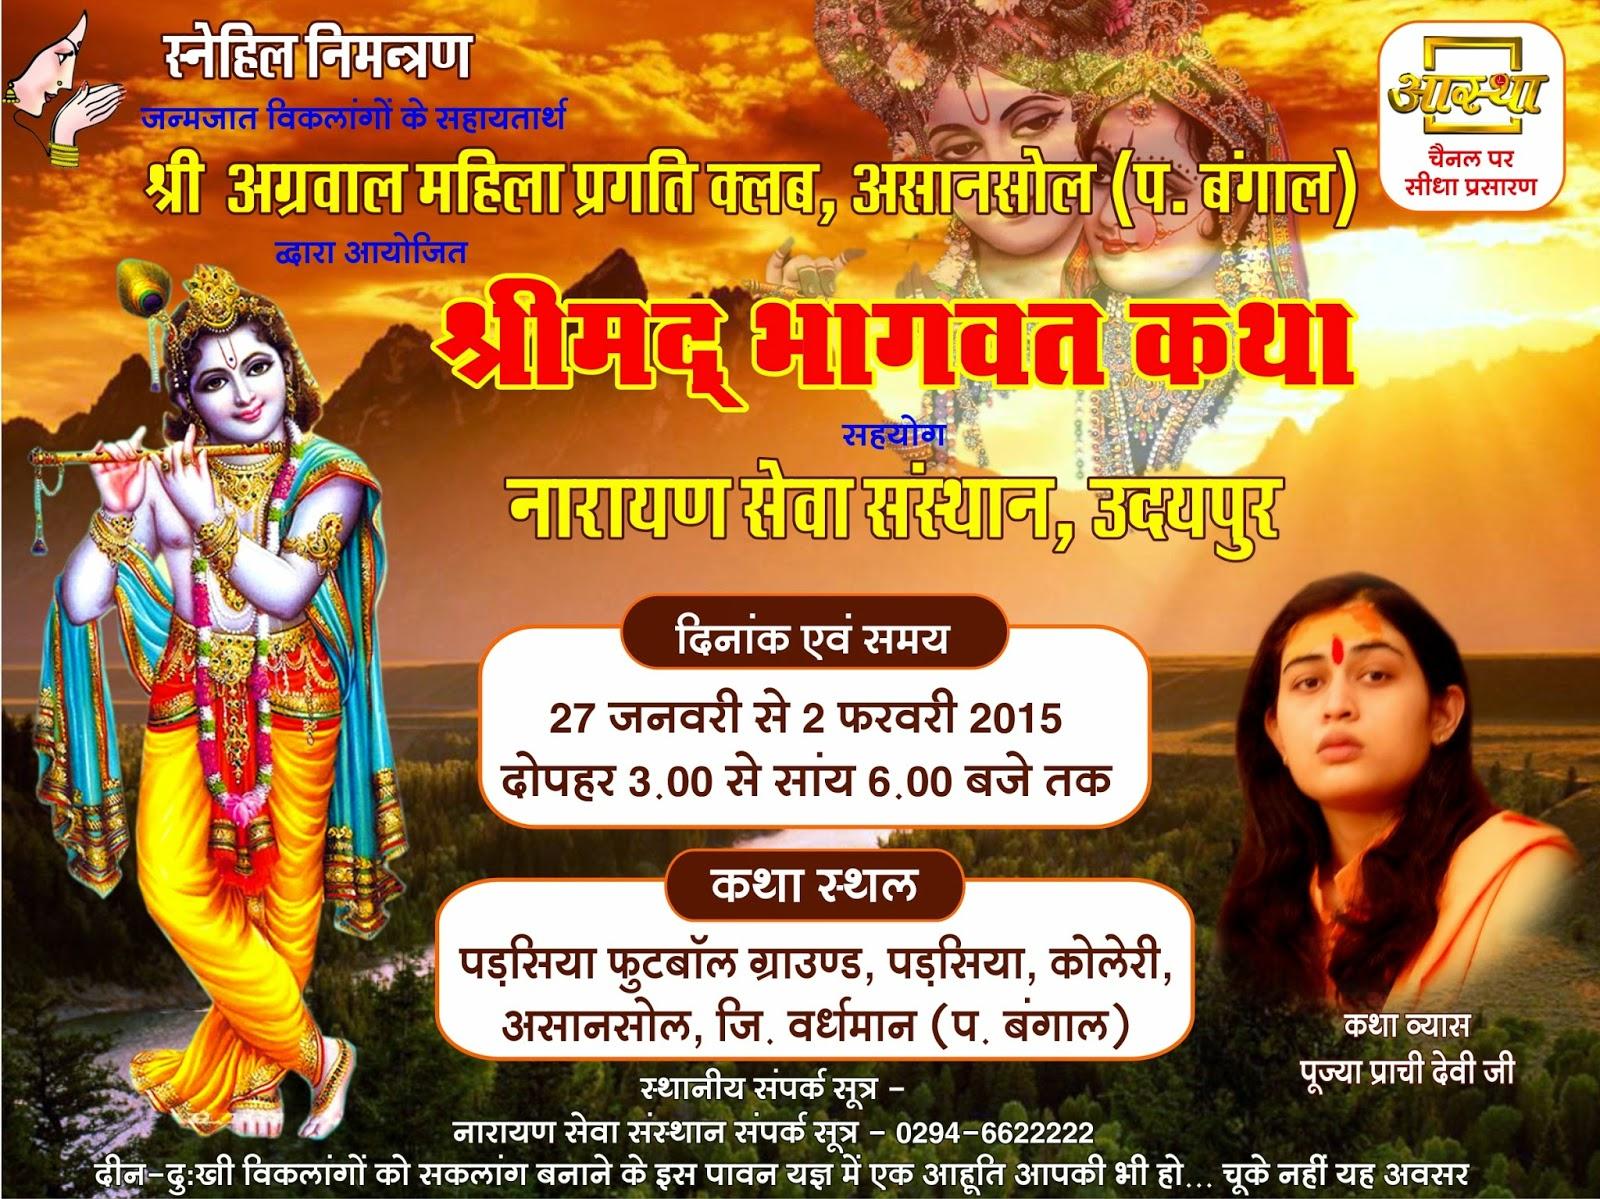 Bhagwat Katha Wallpaper Bhagwat Katha Function on